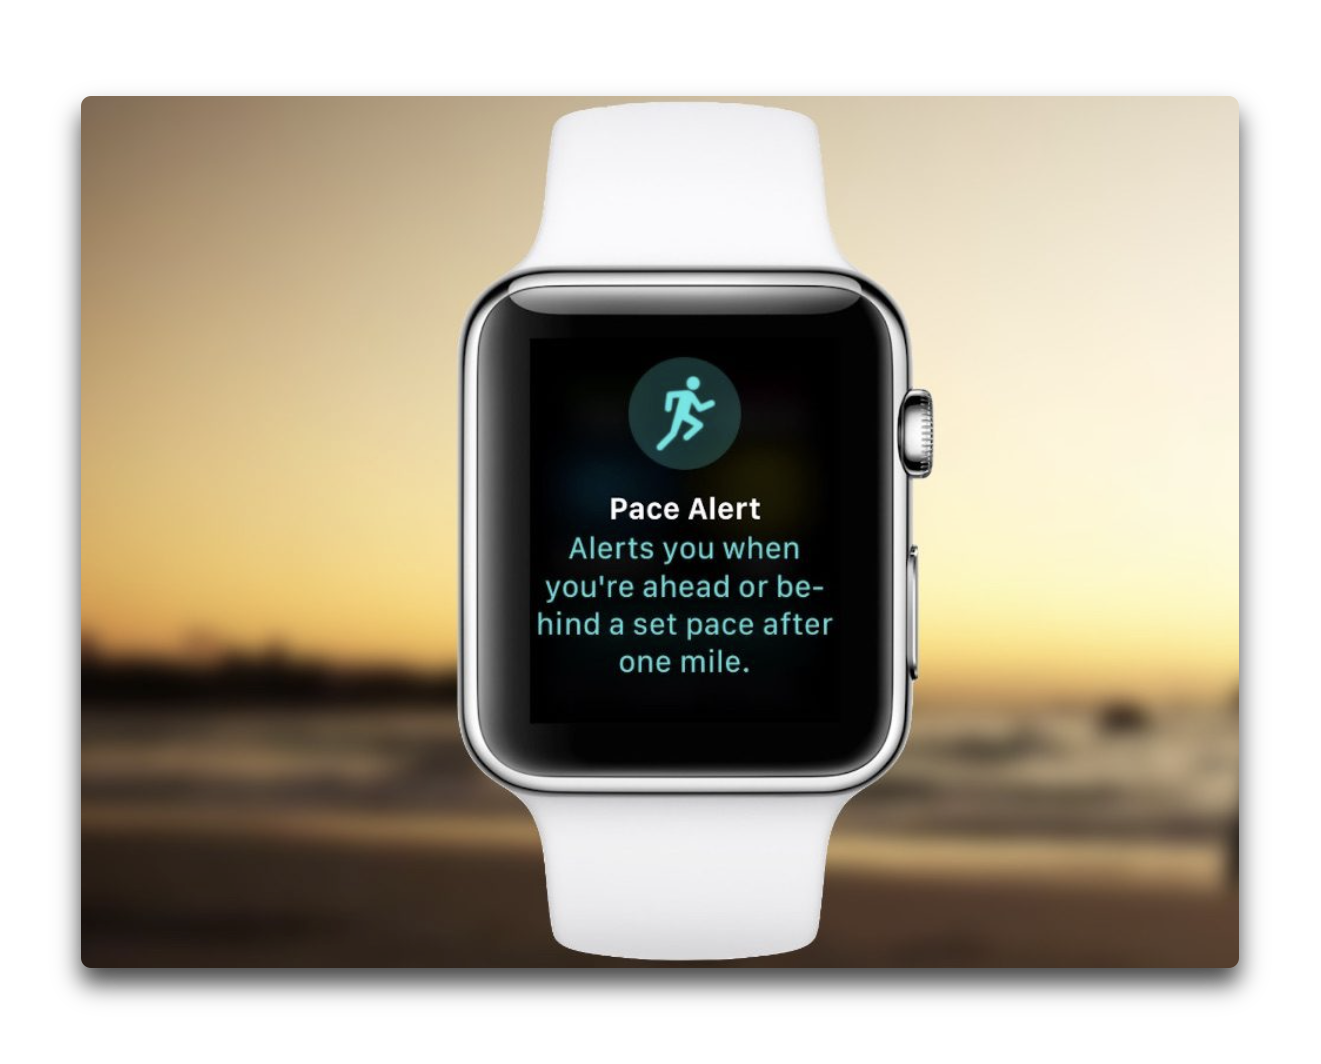 Apple Watch、watchOS 5でケイデンスとペースアラートが利用可能に